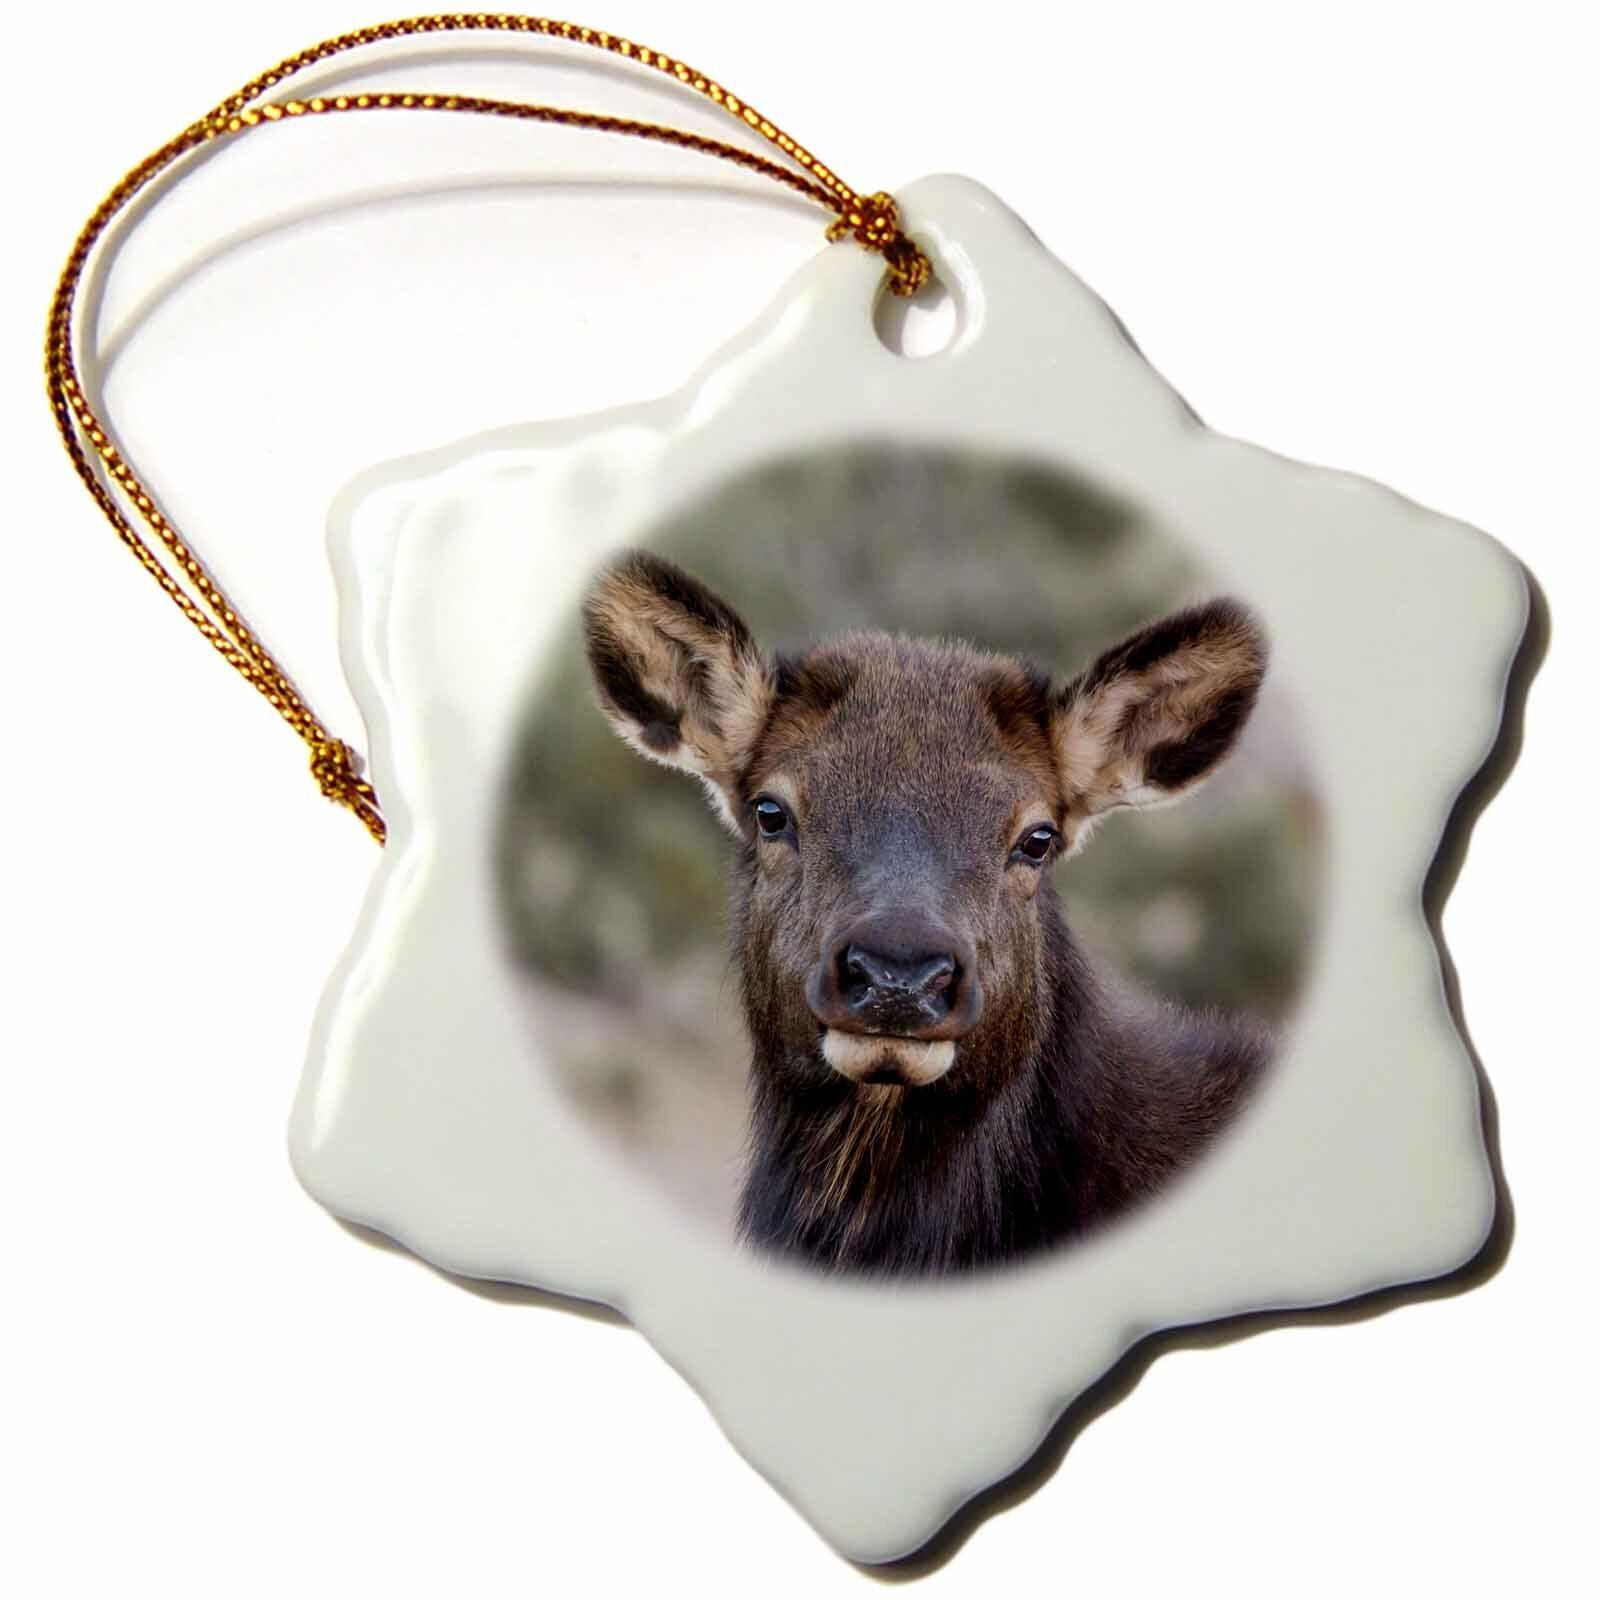 The Holiday Aisle Usa Colorado Estes Park Rocky Mountain Np Cow Elk Or Wapiti Snowflake Holiday Shaped Ornament Wayfair